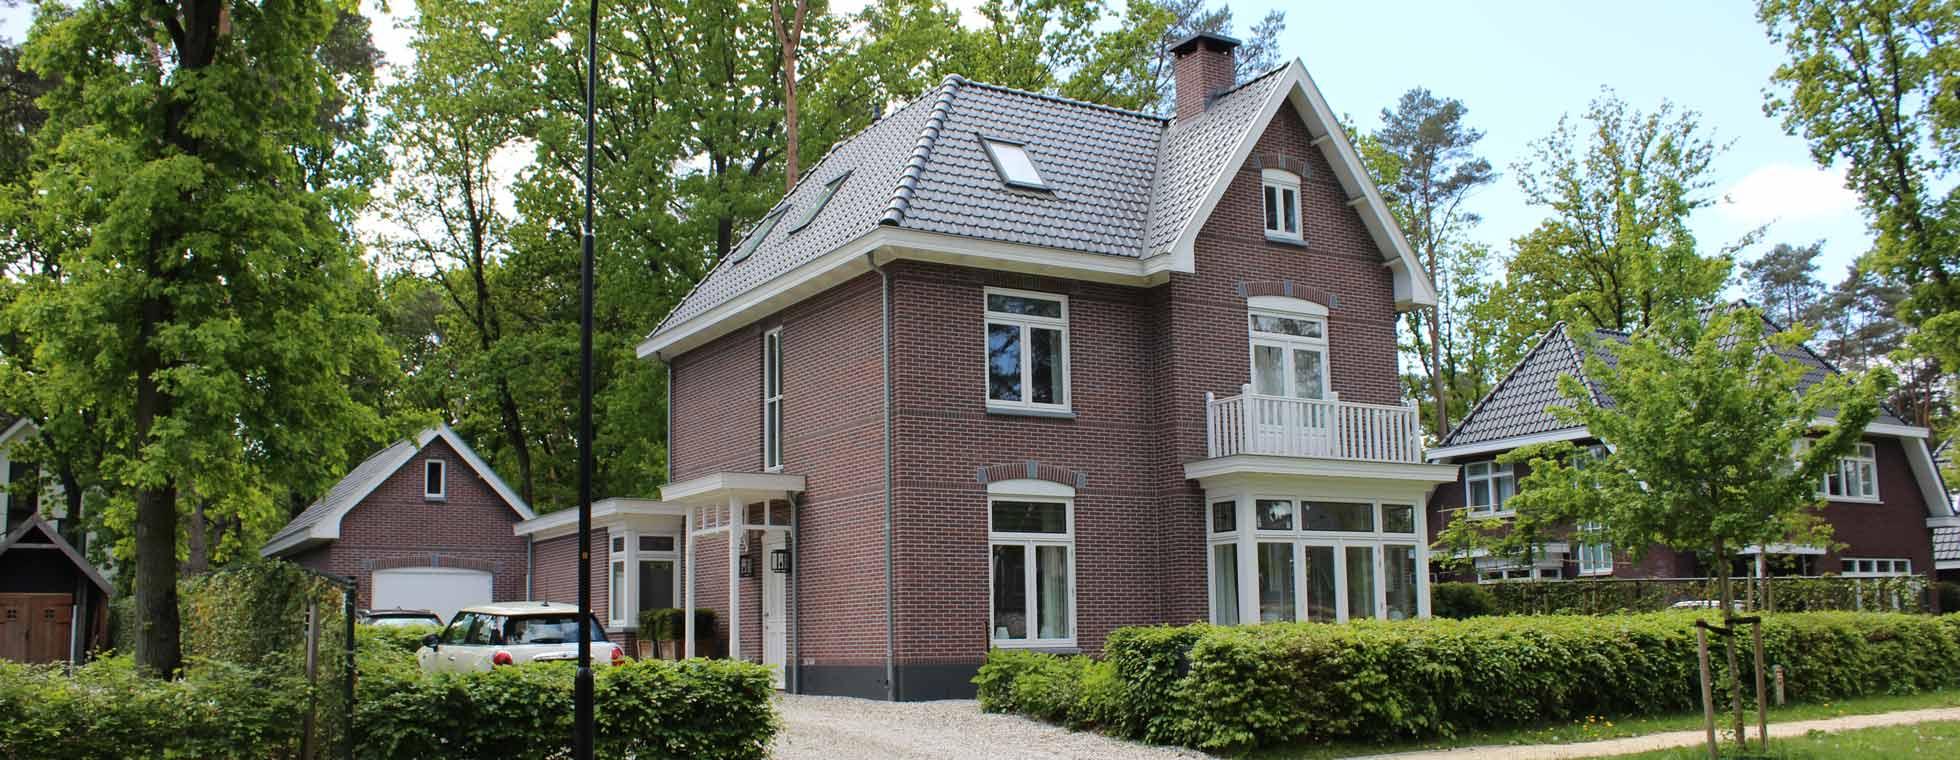 herenhuis -villa-jaren 20 woning-bouwen